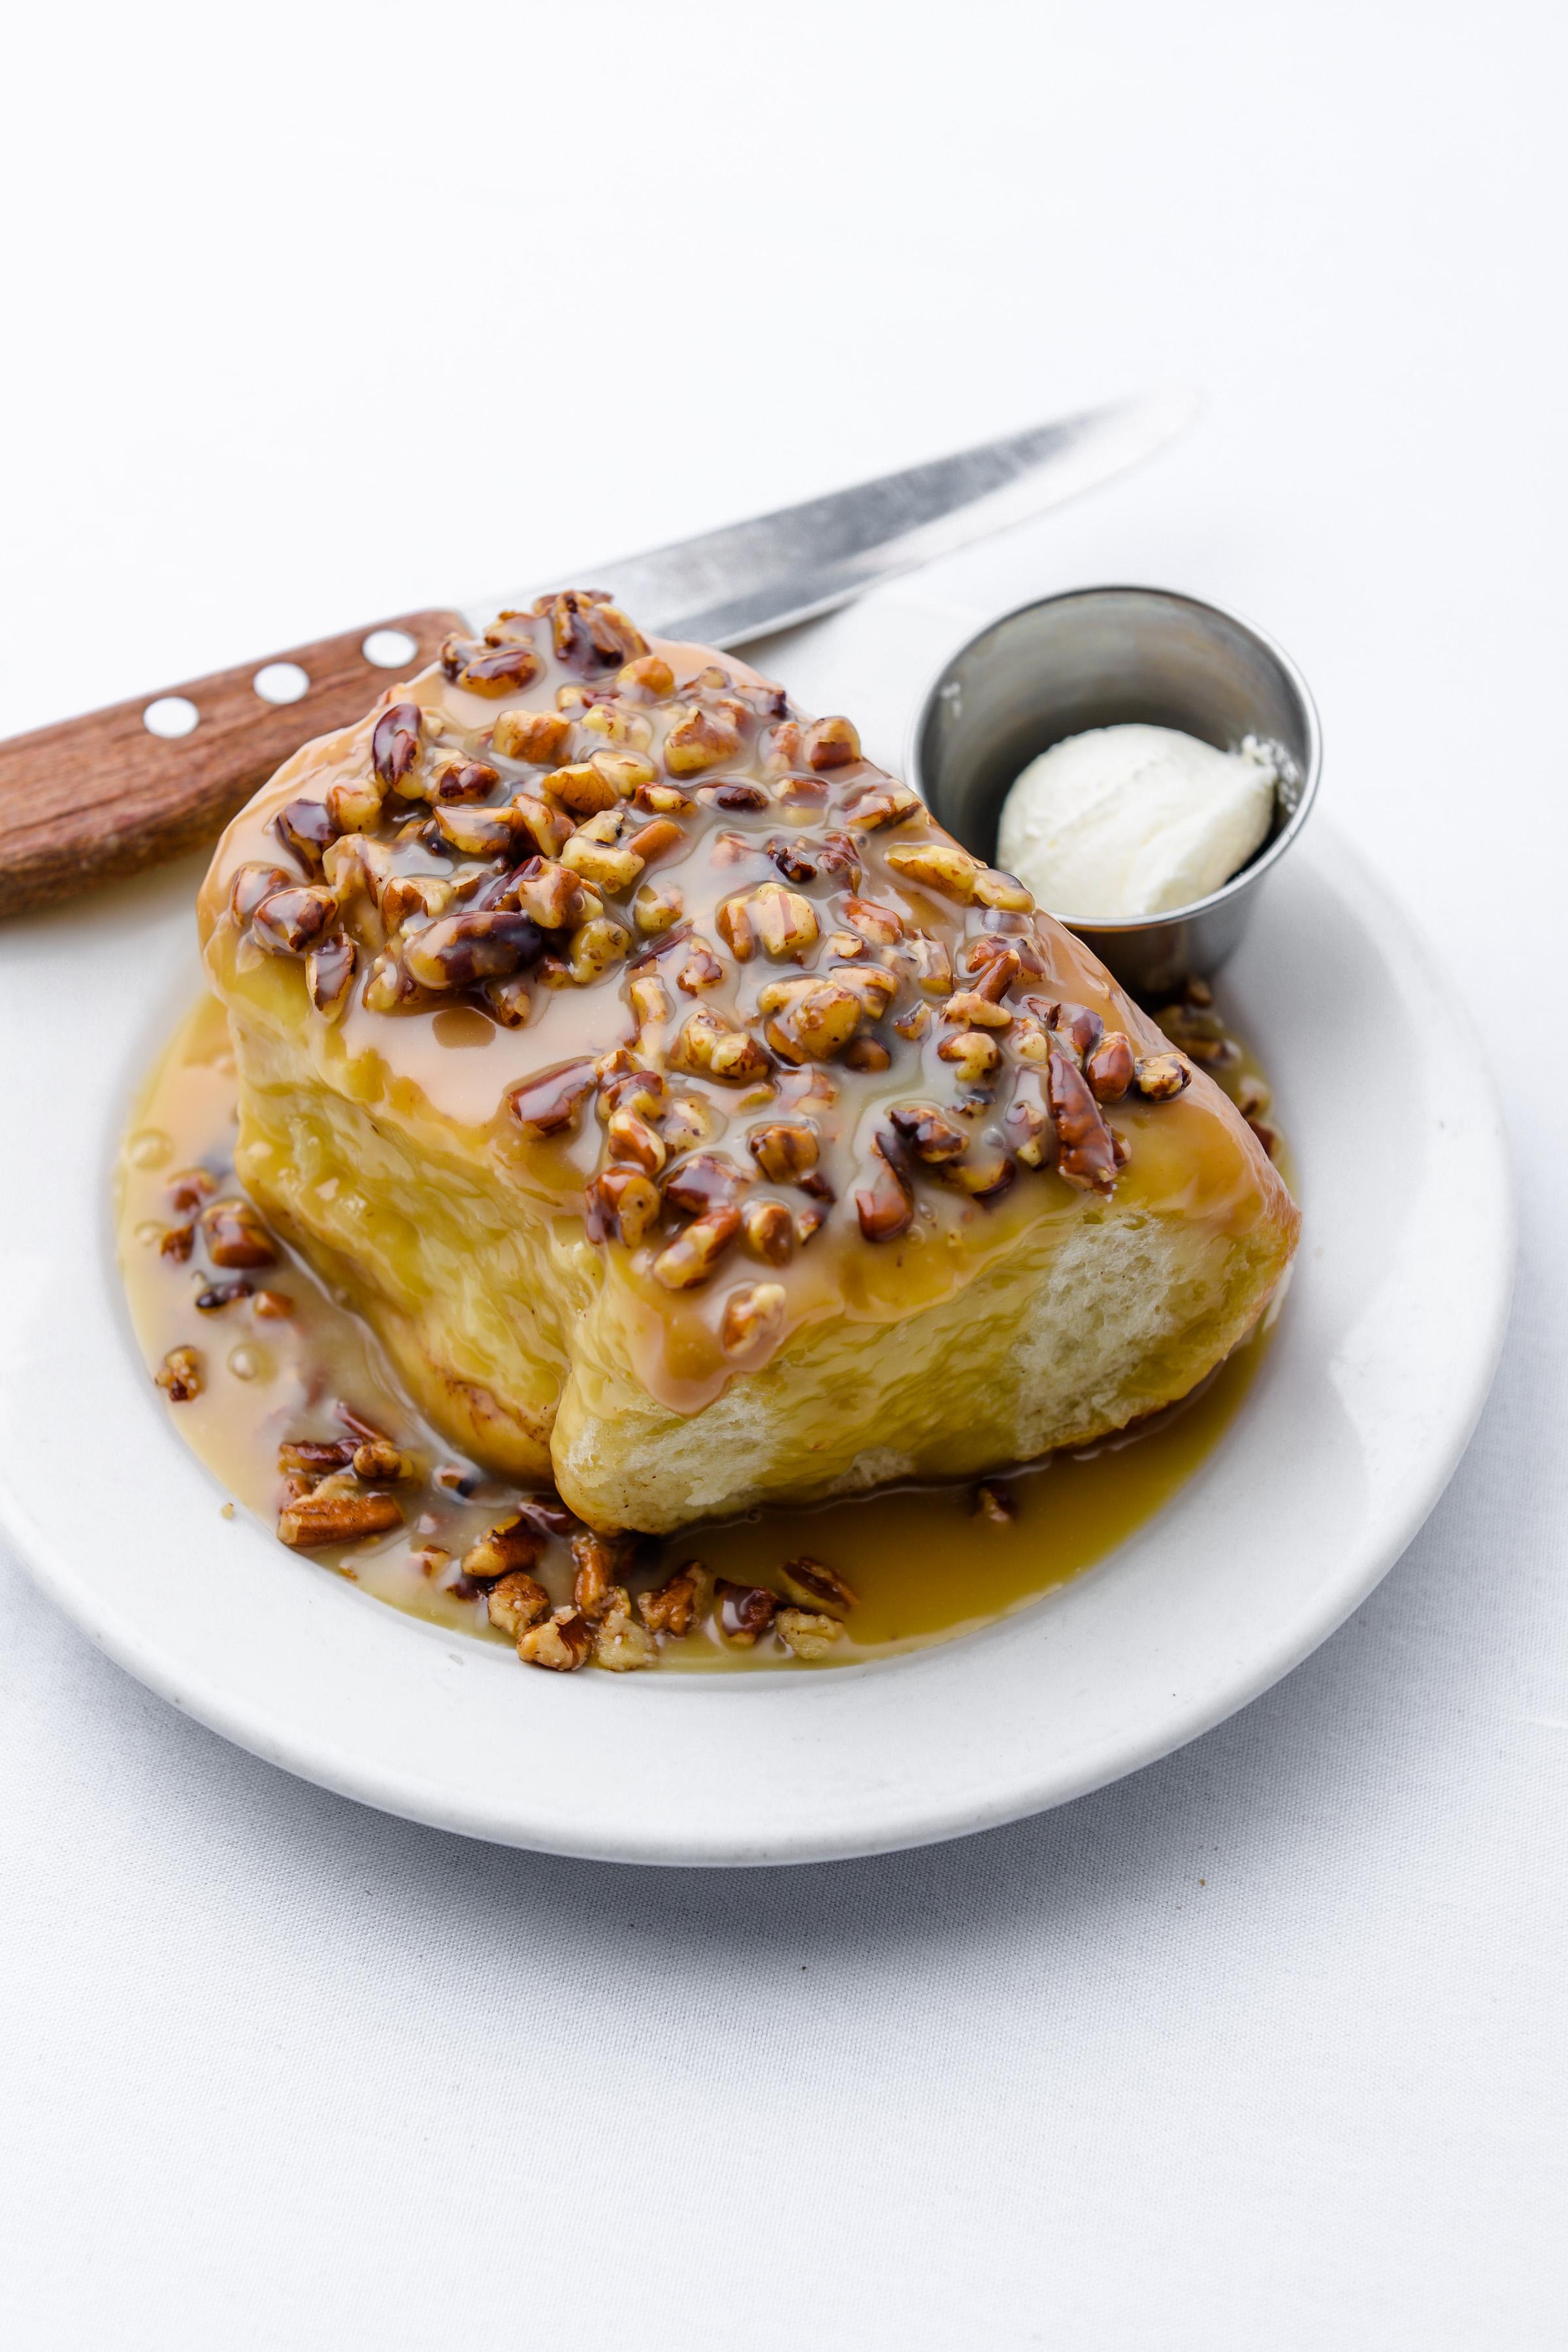 Caramel-Pecan Roll